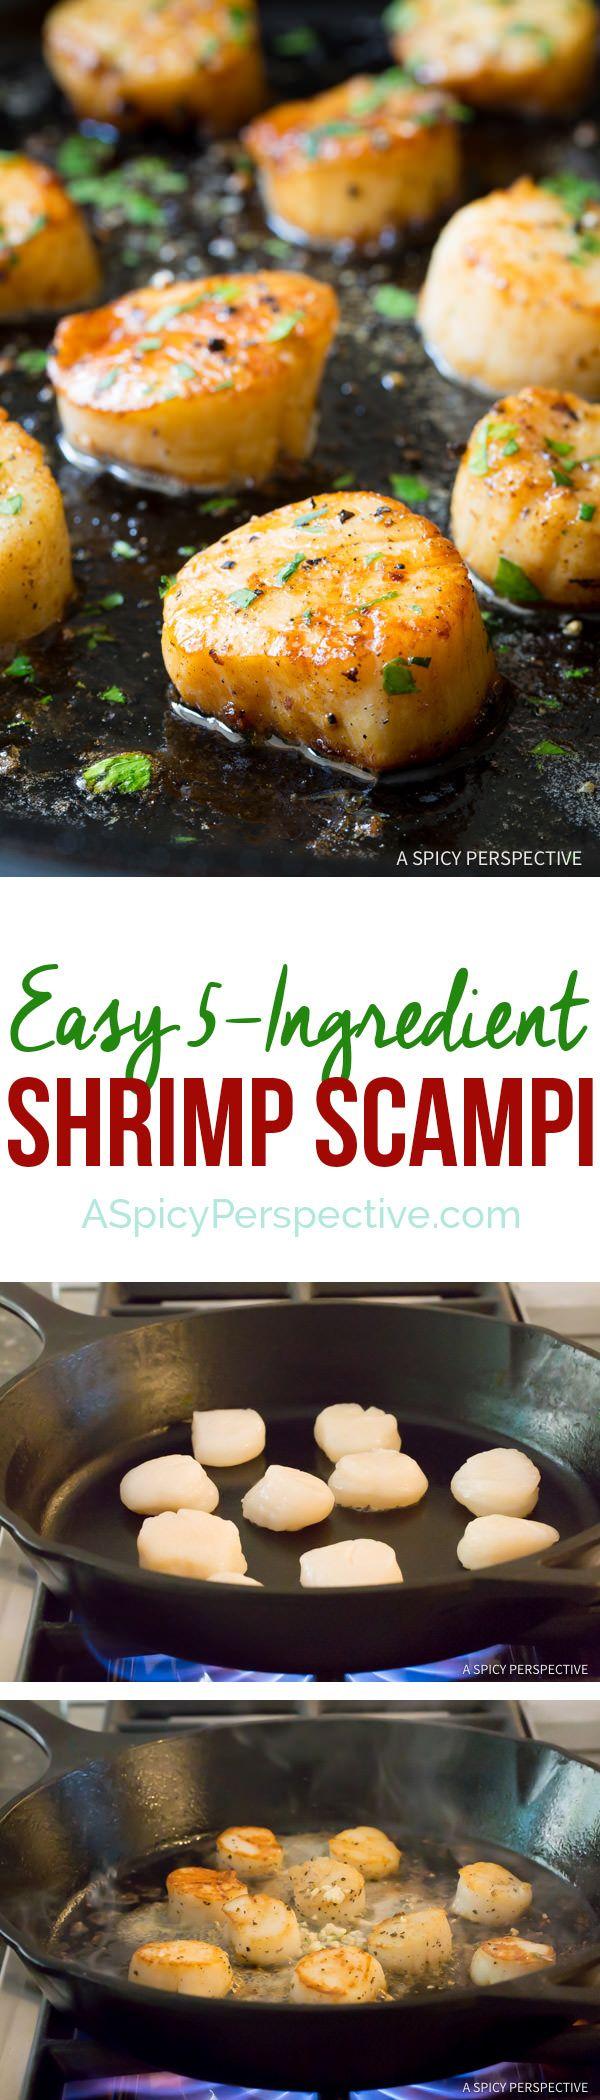 Healthy 5-Ingredient Easy Scallop Scampi Recipe | ASpicyPerspective.com